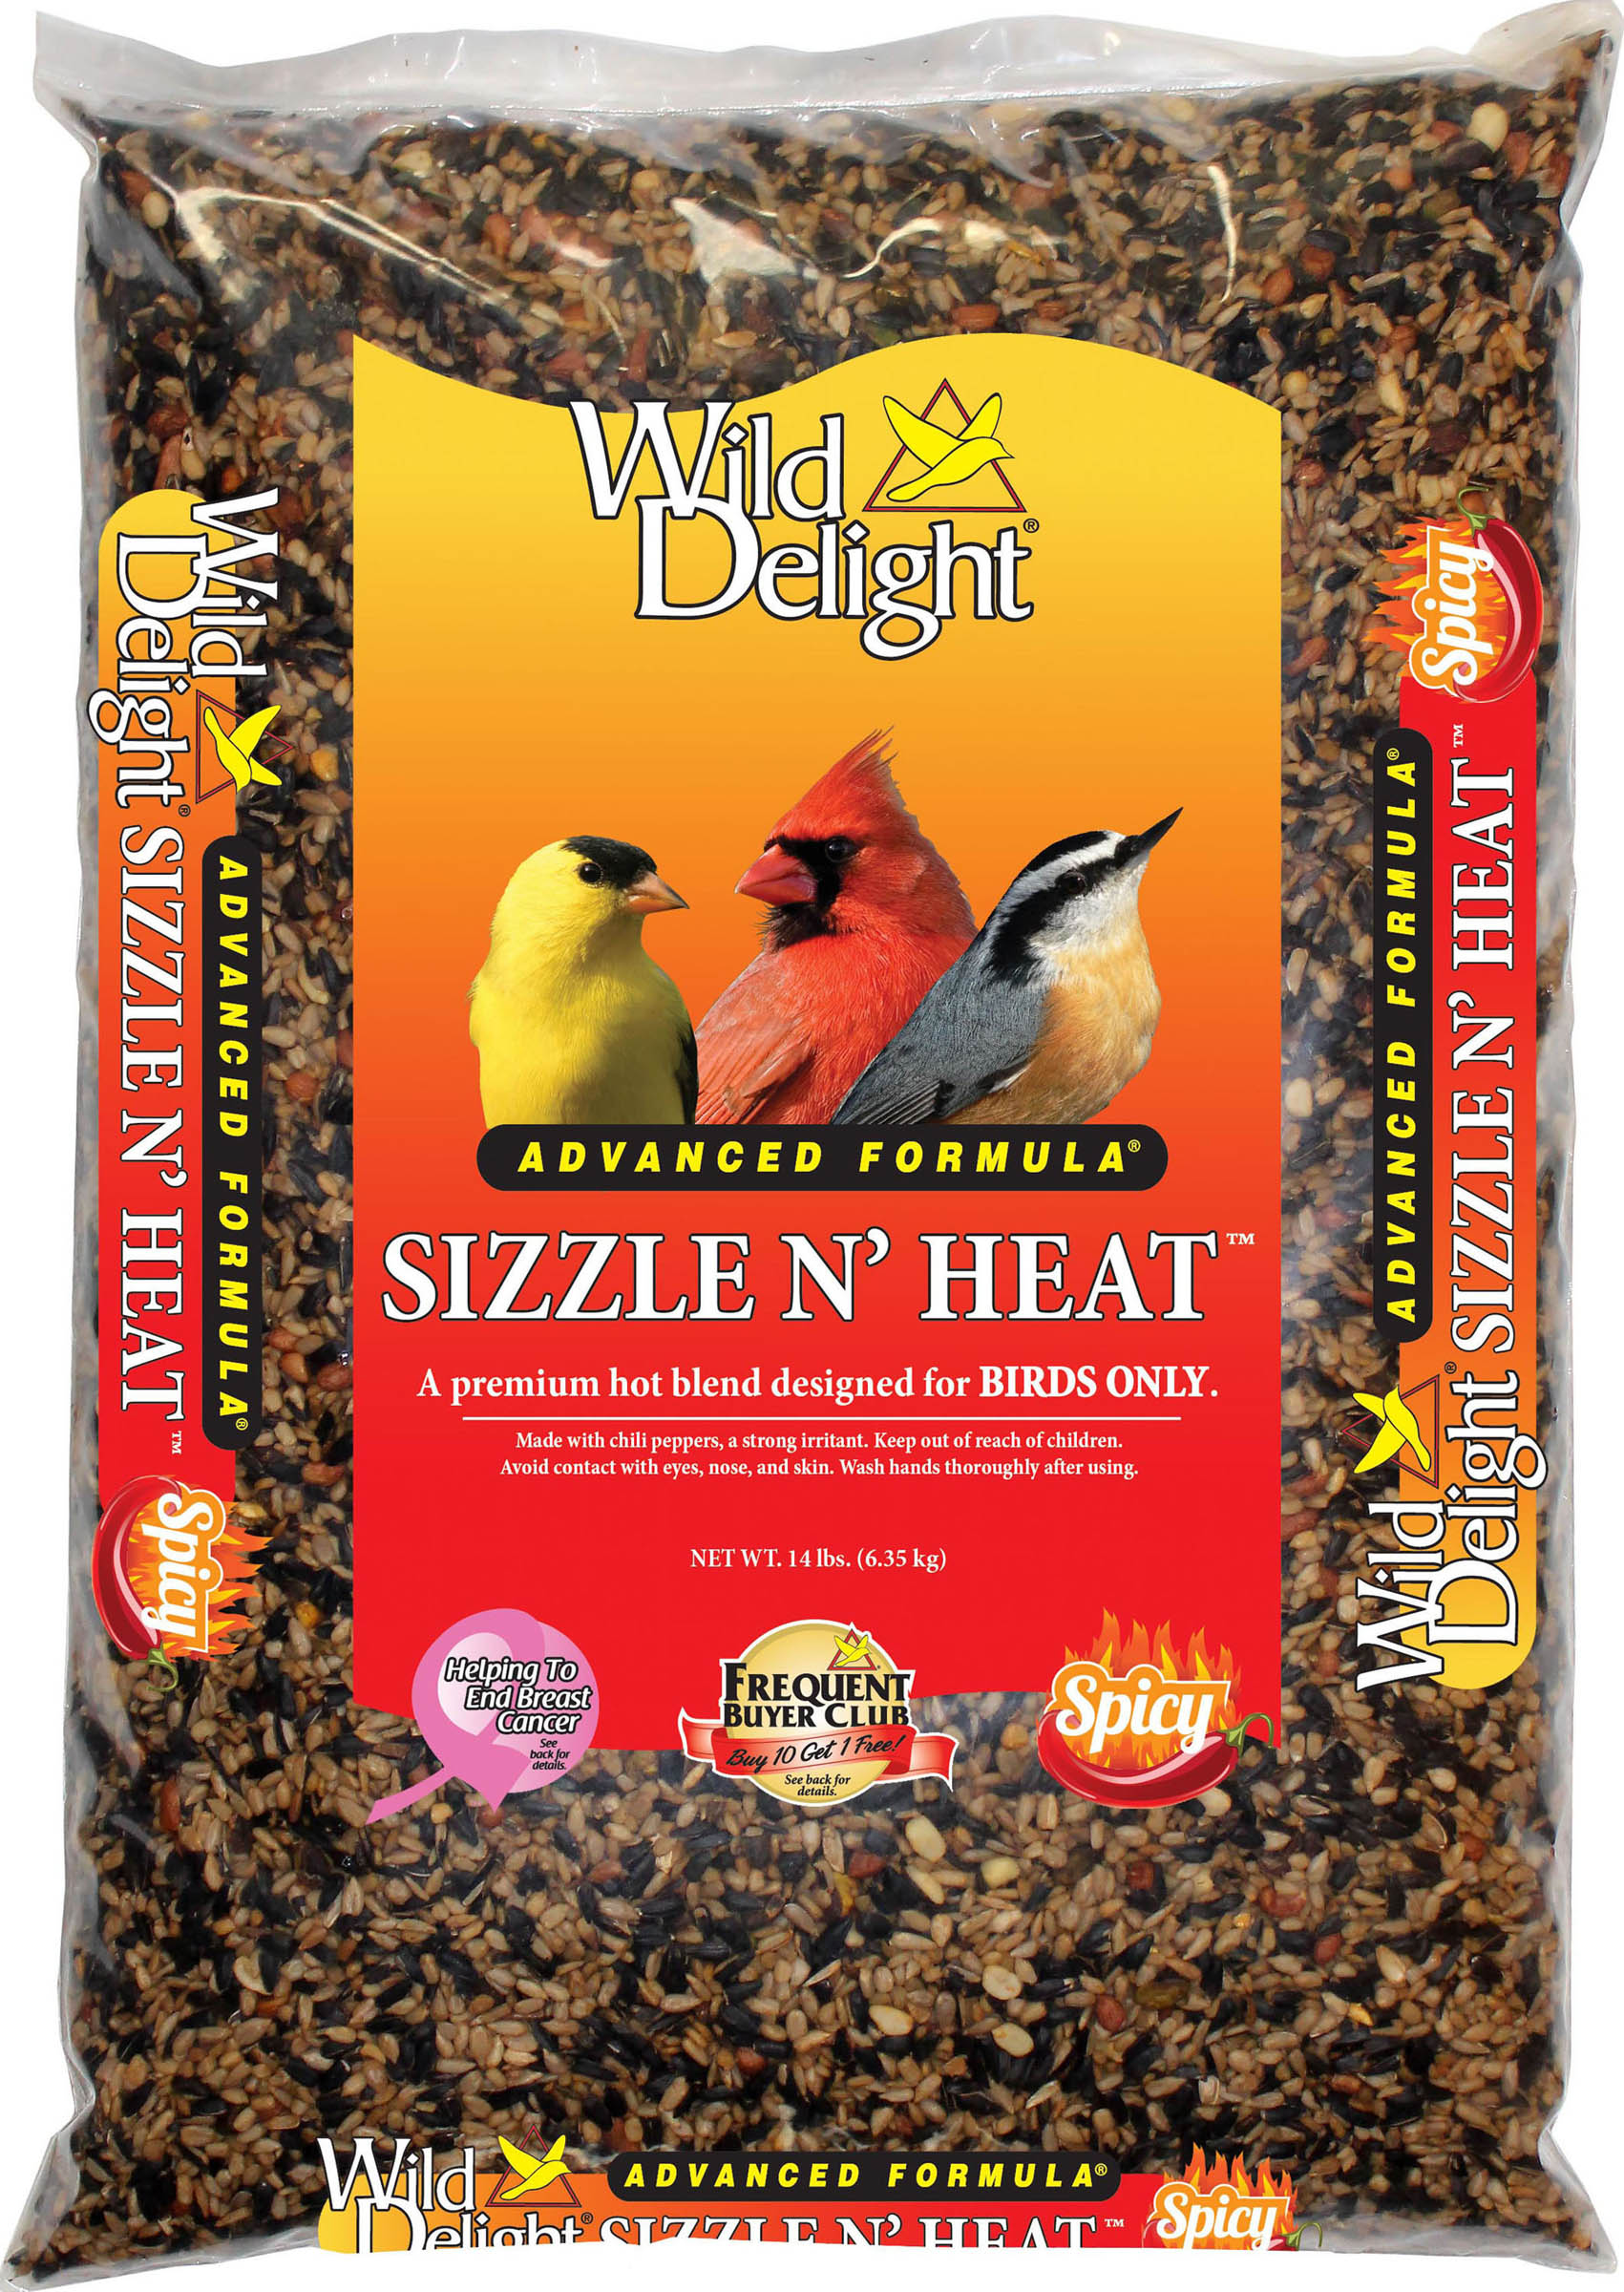 Wild Delight Sizzle N' Heat Wild Bird Food Image